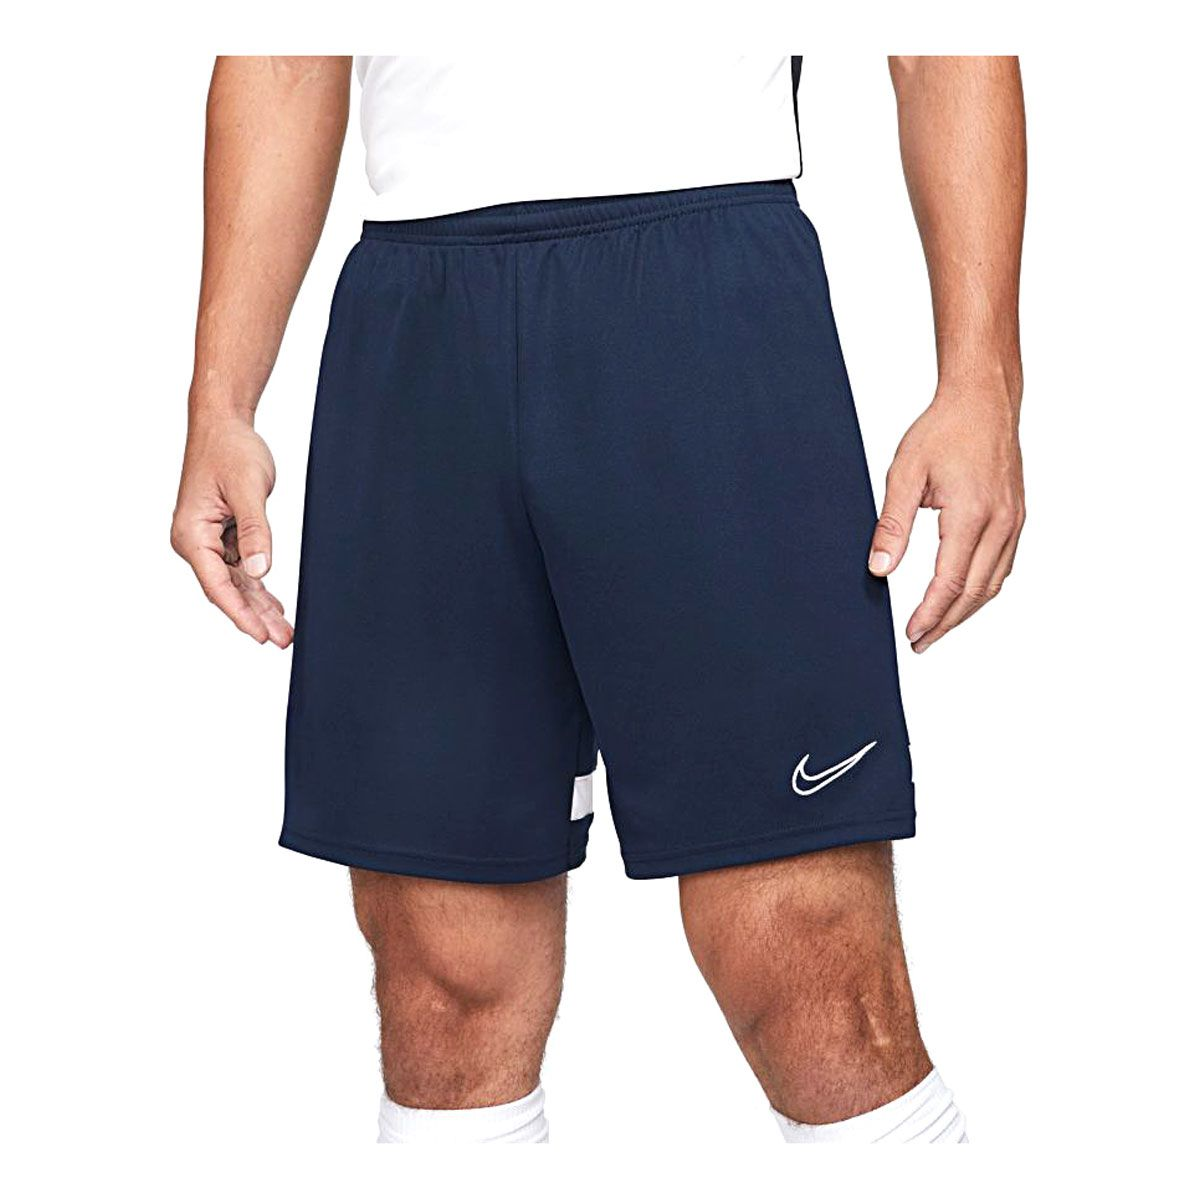 Pantaloncini Nike Dri-FIT Academy Uomo Blu Bianco